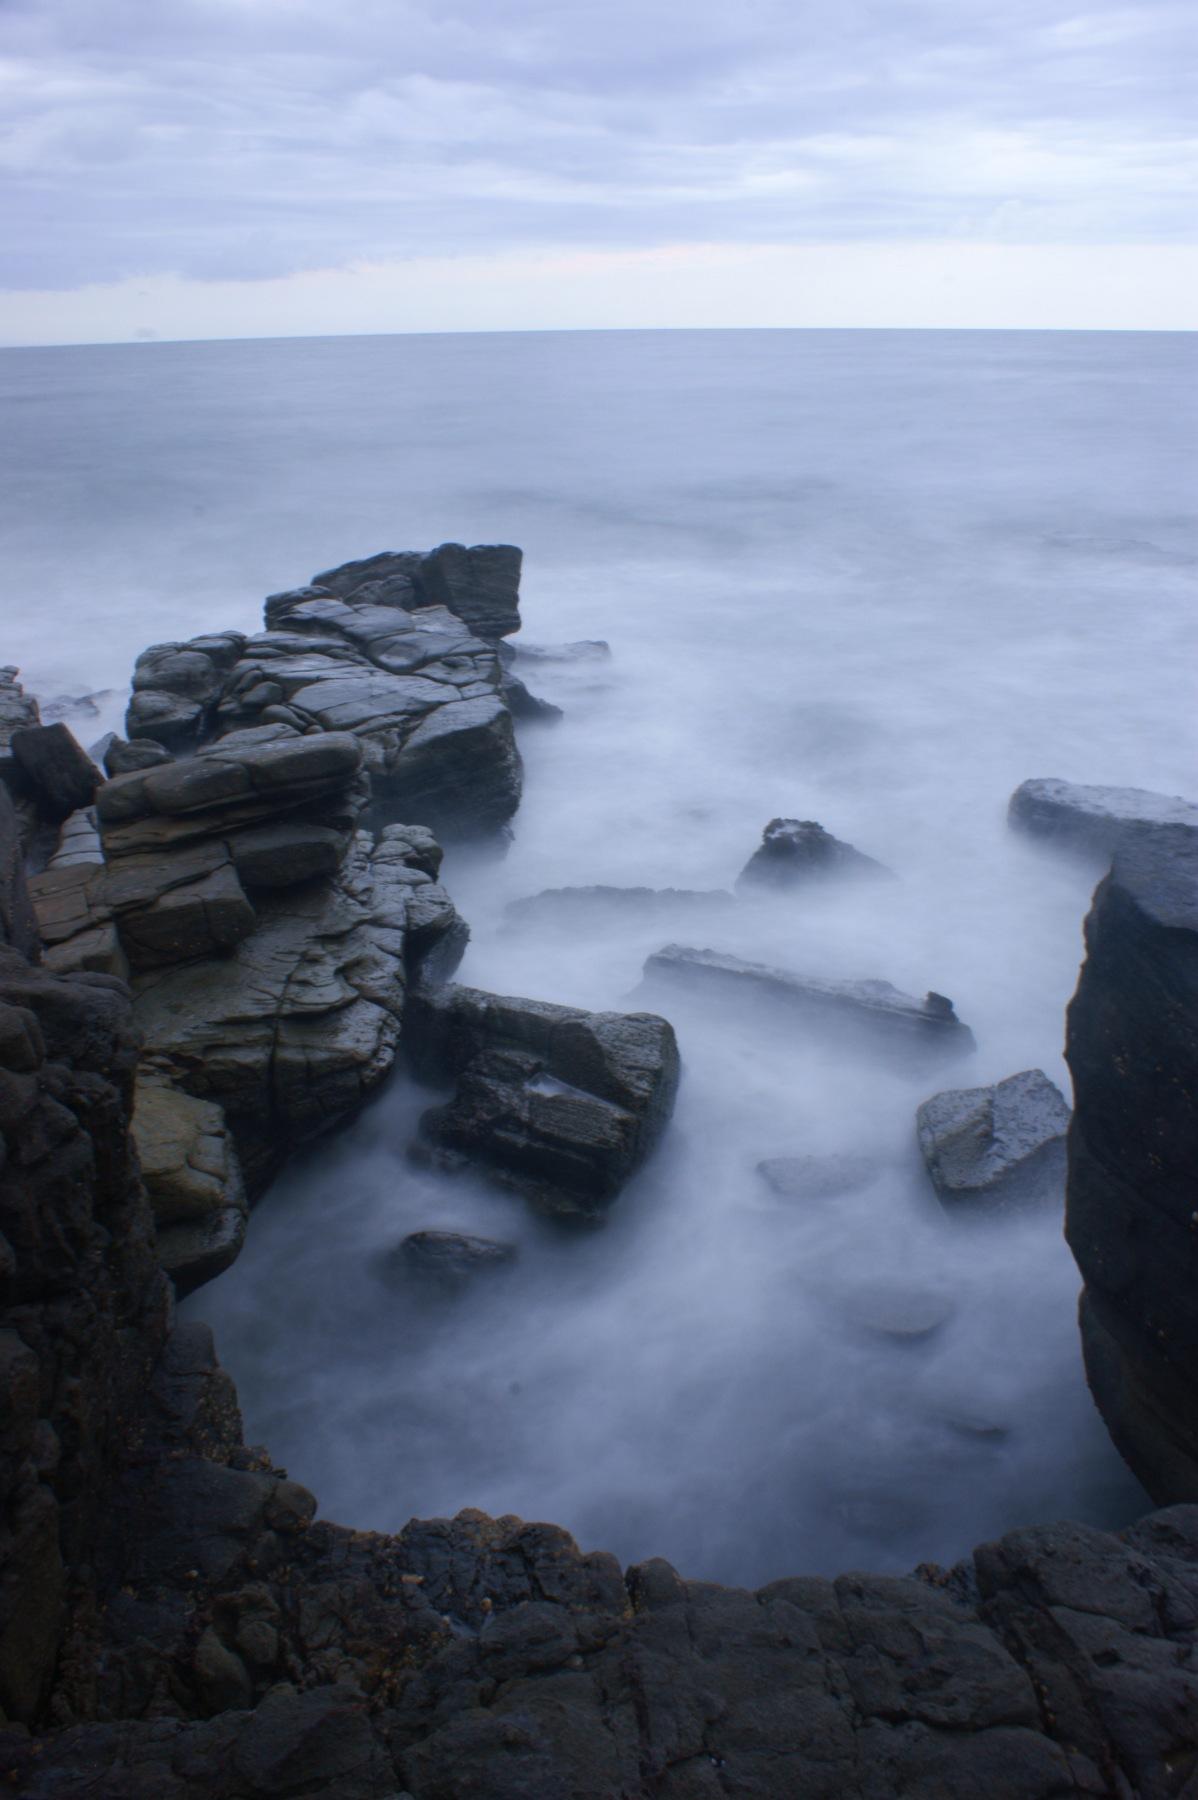 https://www.images.scottphotographics.com/shot-of-the-day/%234/On-the-rocks-Mooloolaba04.jpg